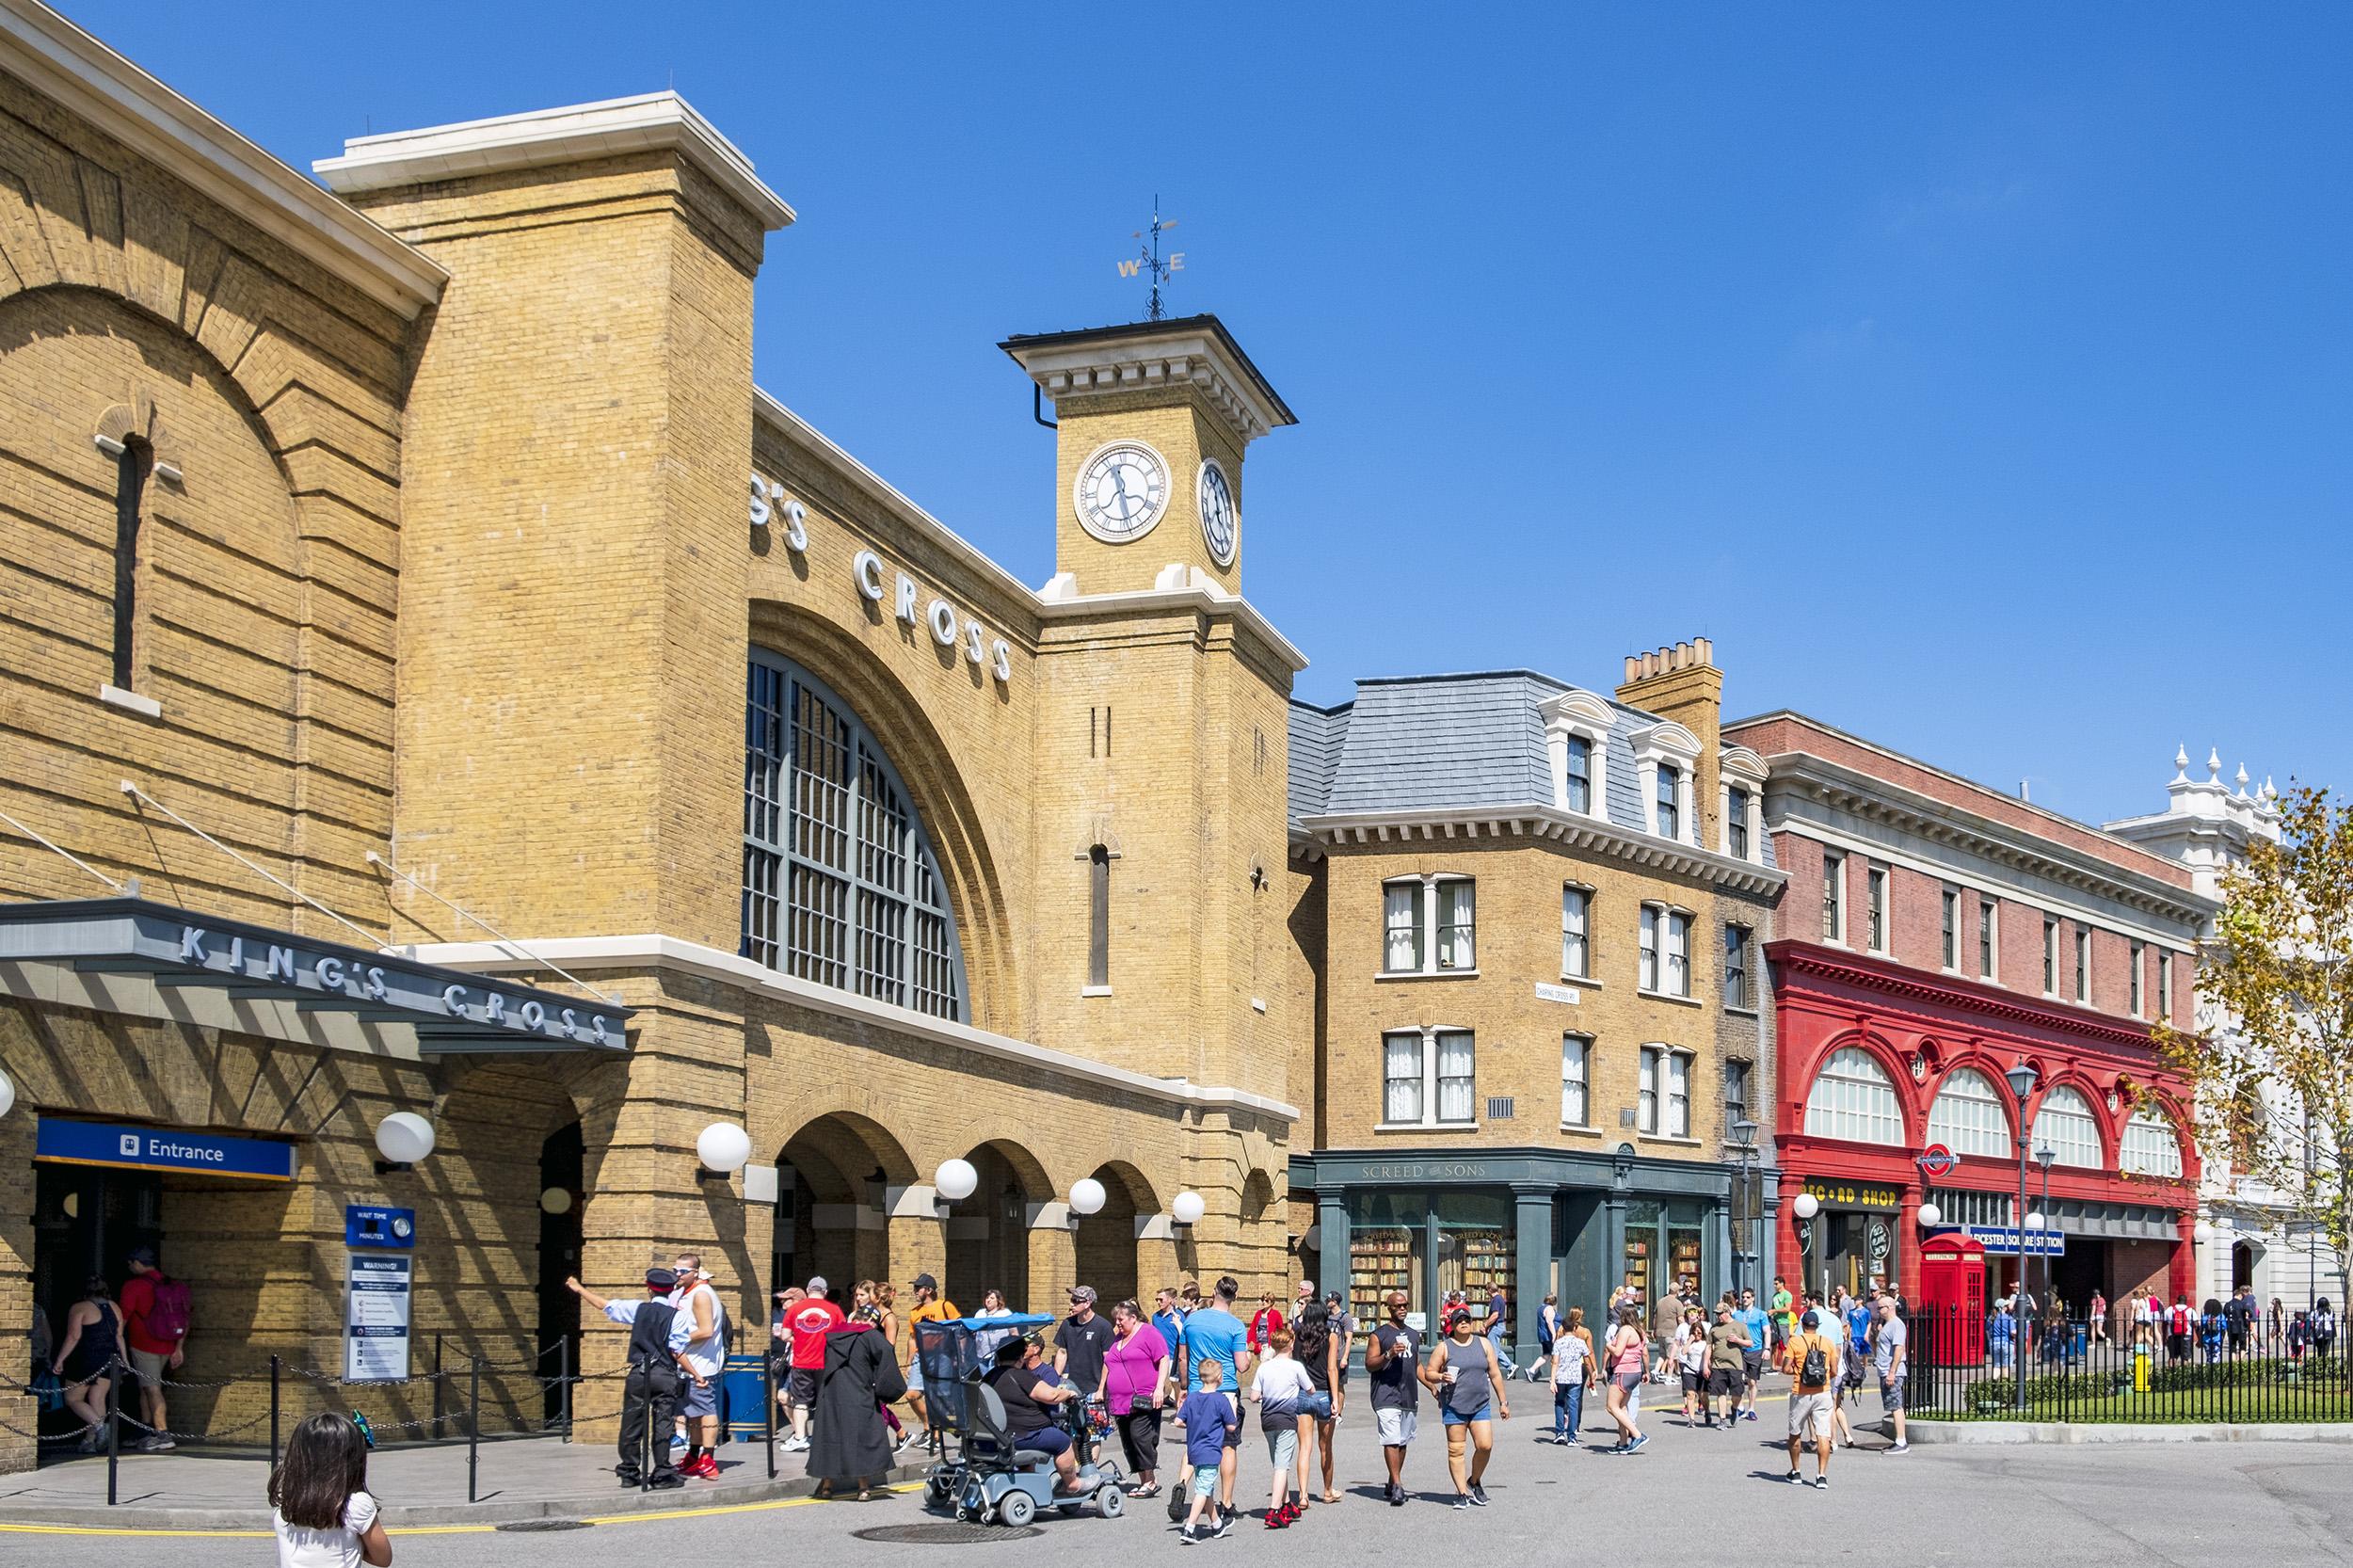 Kings Cross Station Hogwarts The Wizarding World of Harry Potter Orlando